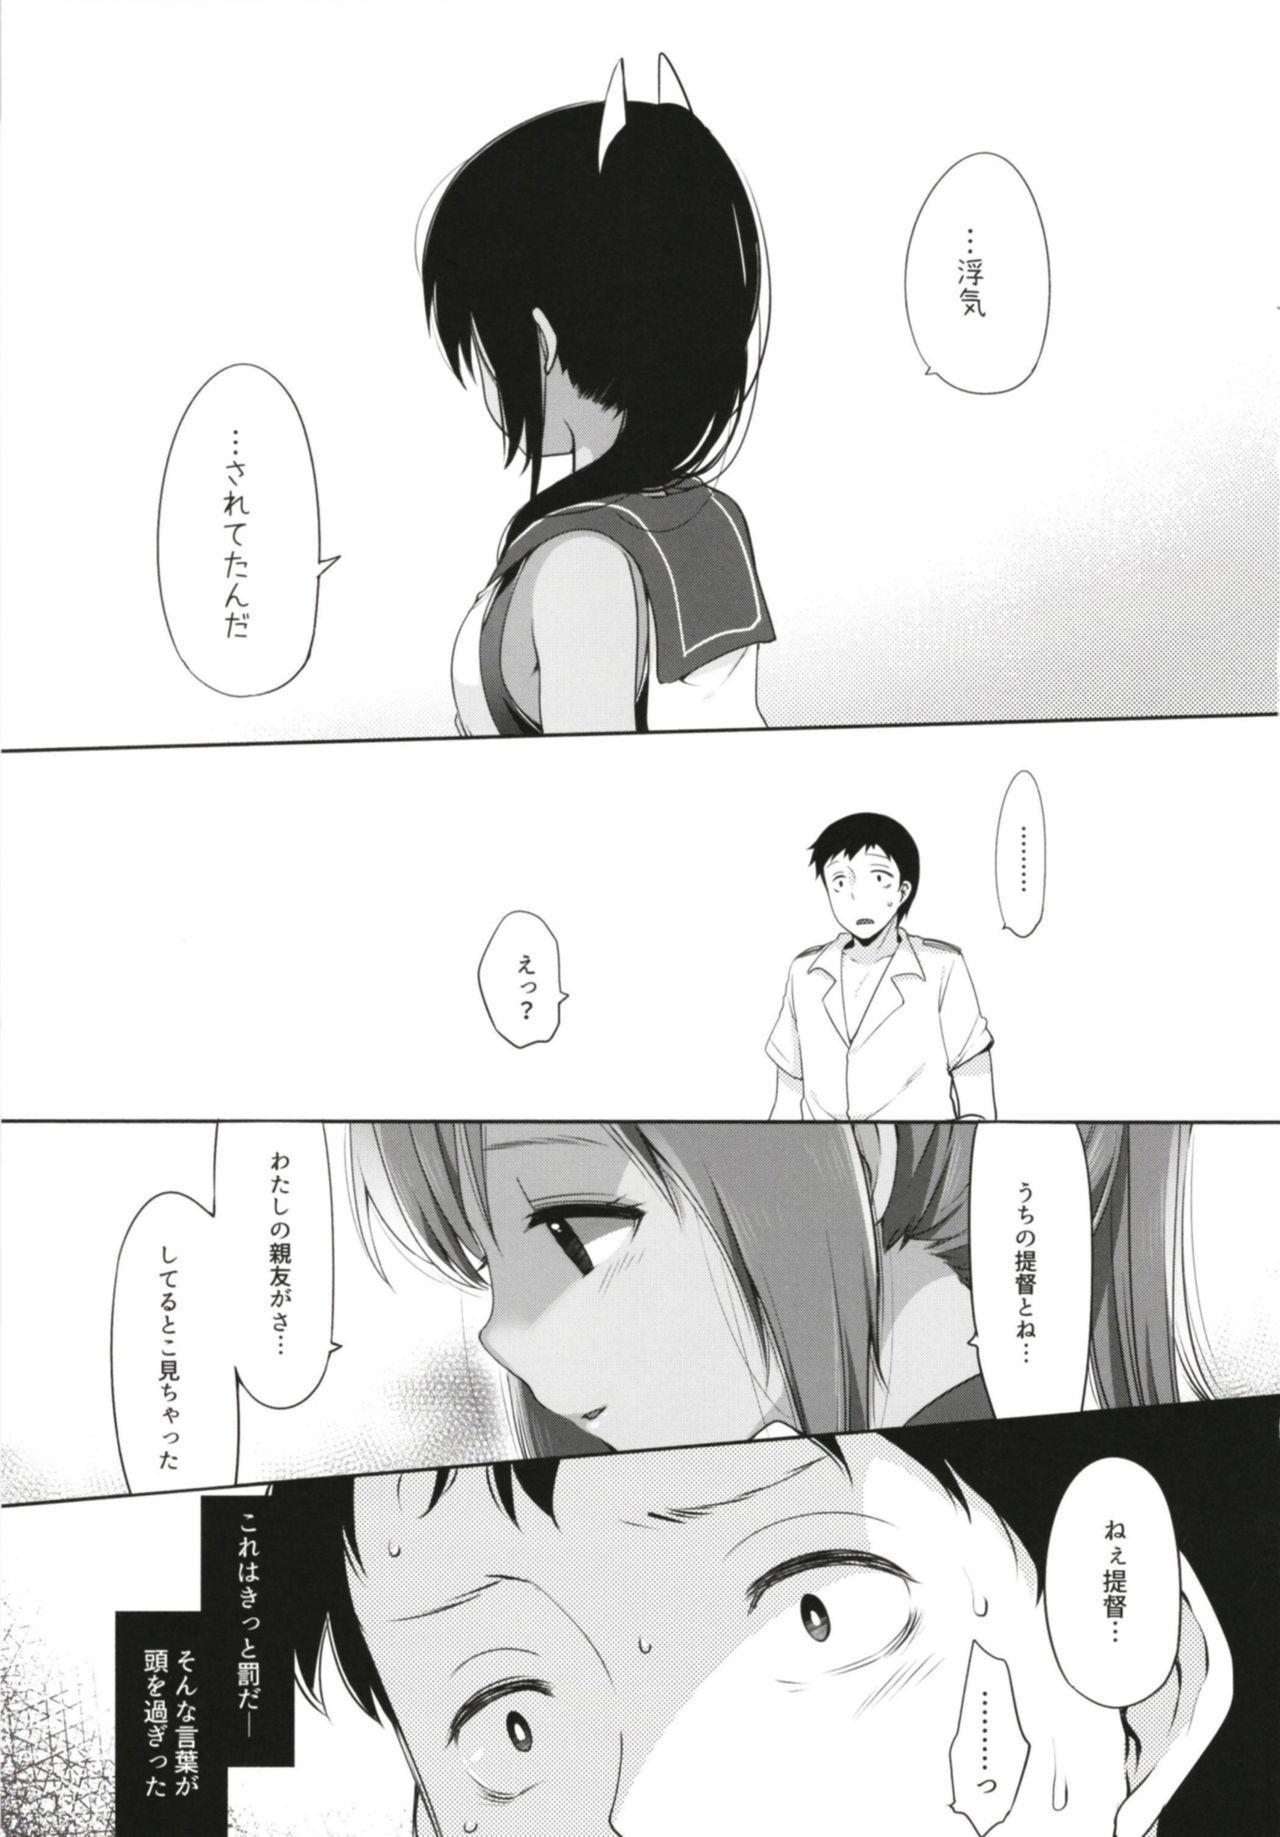 [French letter (Fujisaki Hikari)] Hitonatsu no Ayamachi -I-401 Soushuuhen- (Kantai Collection -KanColle-) [Digital] 56